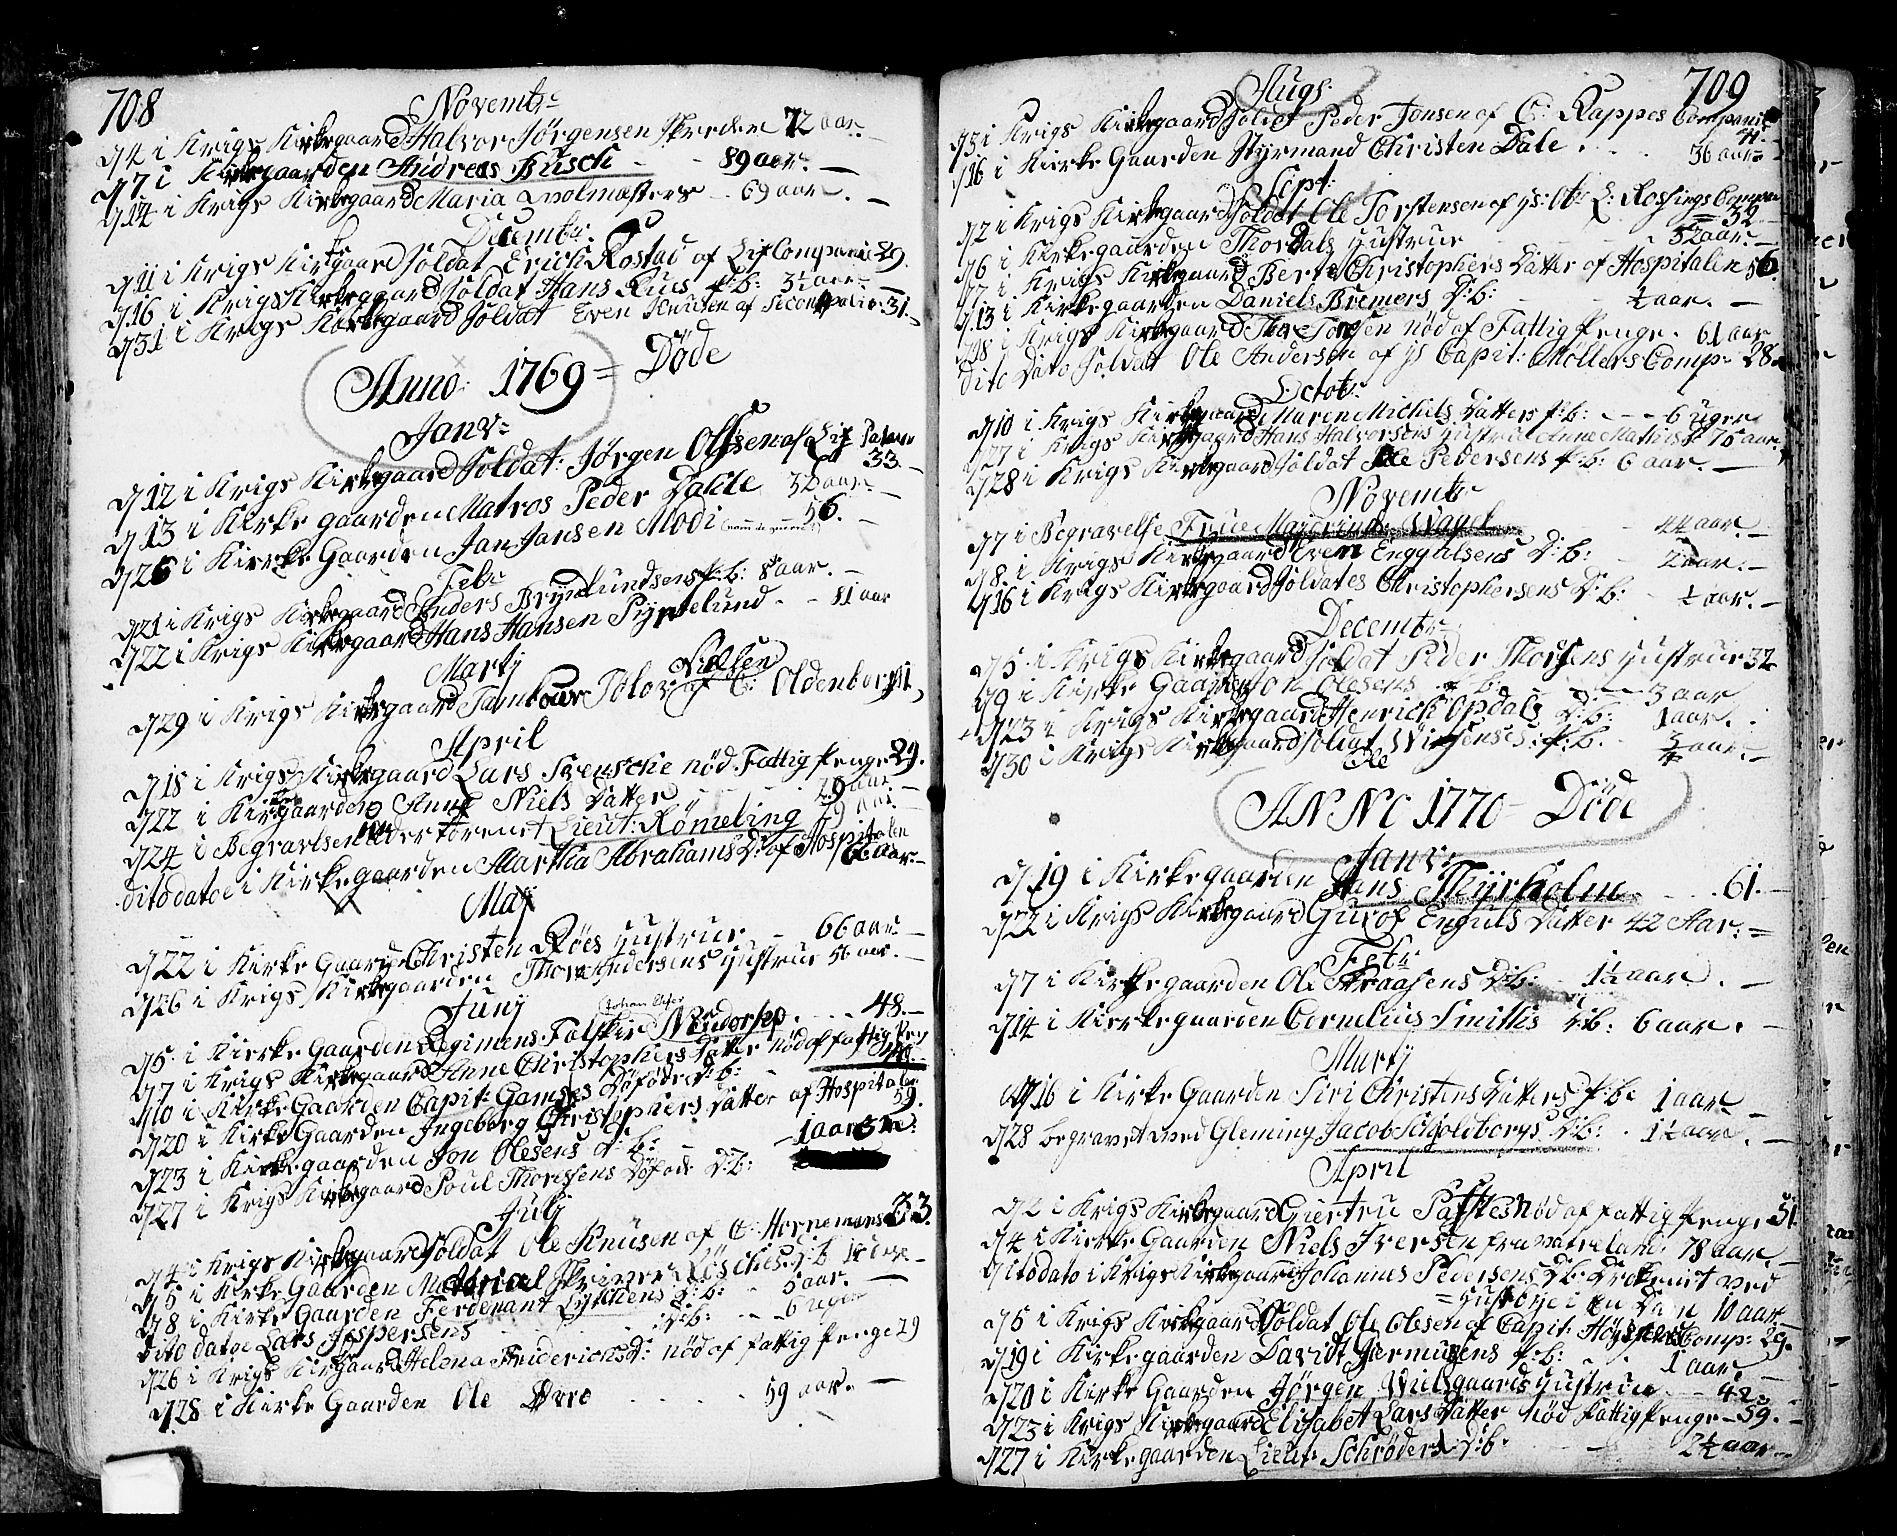 SAO, Fredrikstad prestekontor Kirkebøker, F/Fa/L0002: Ministerialbok nr. 2, 1750-1804, s. 708-709